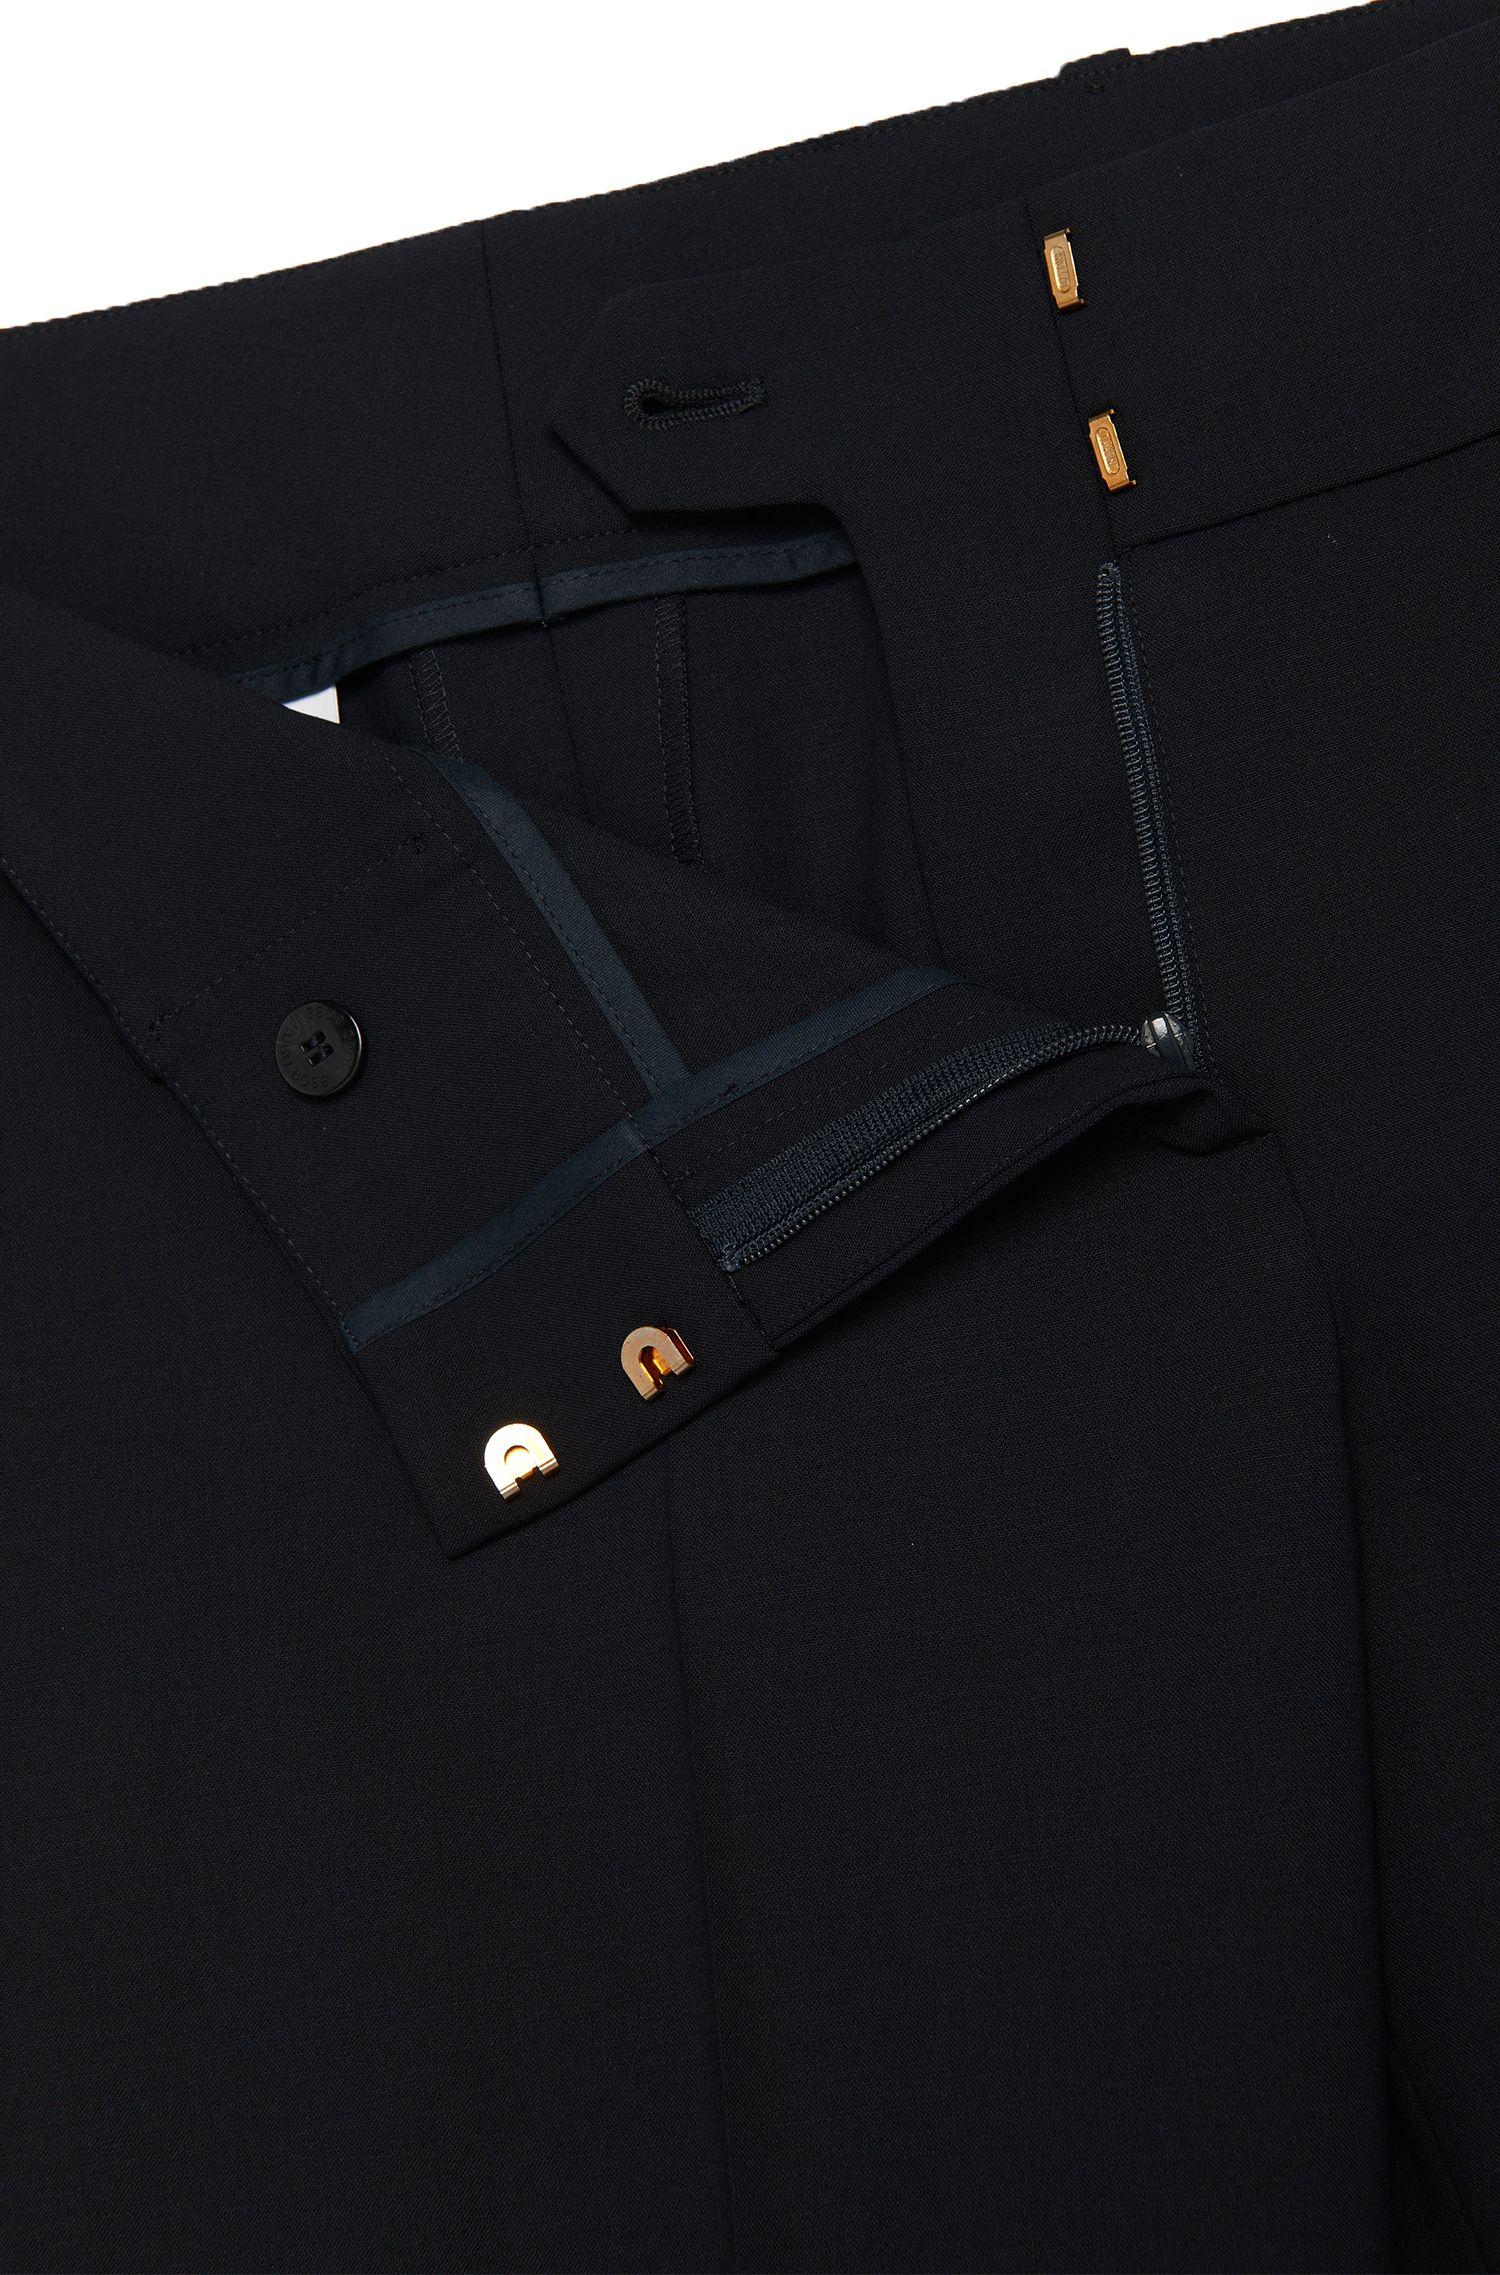 Regular-Fit Hose aus Stretch-Schurwolle: 'Tuliana2'